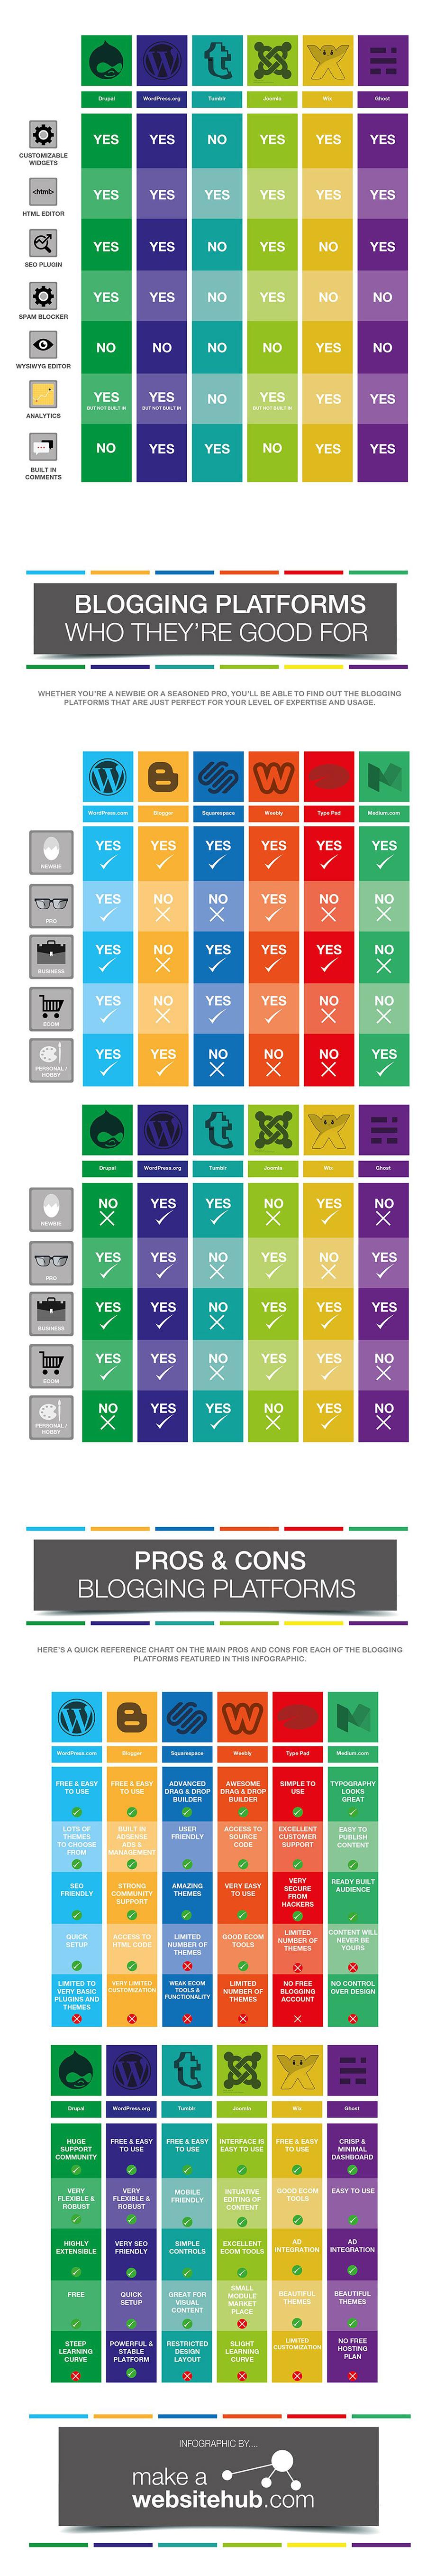 The Ultimate Blogging Platforms Comparison Chart [Infographic] - Part 2